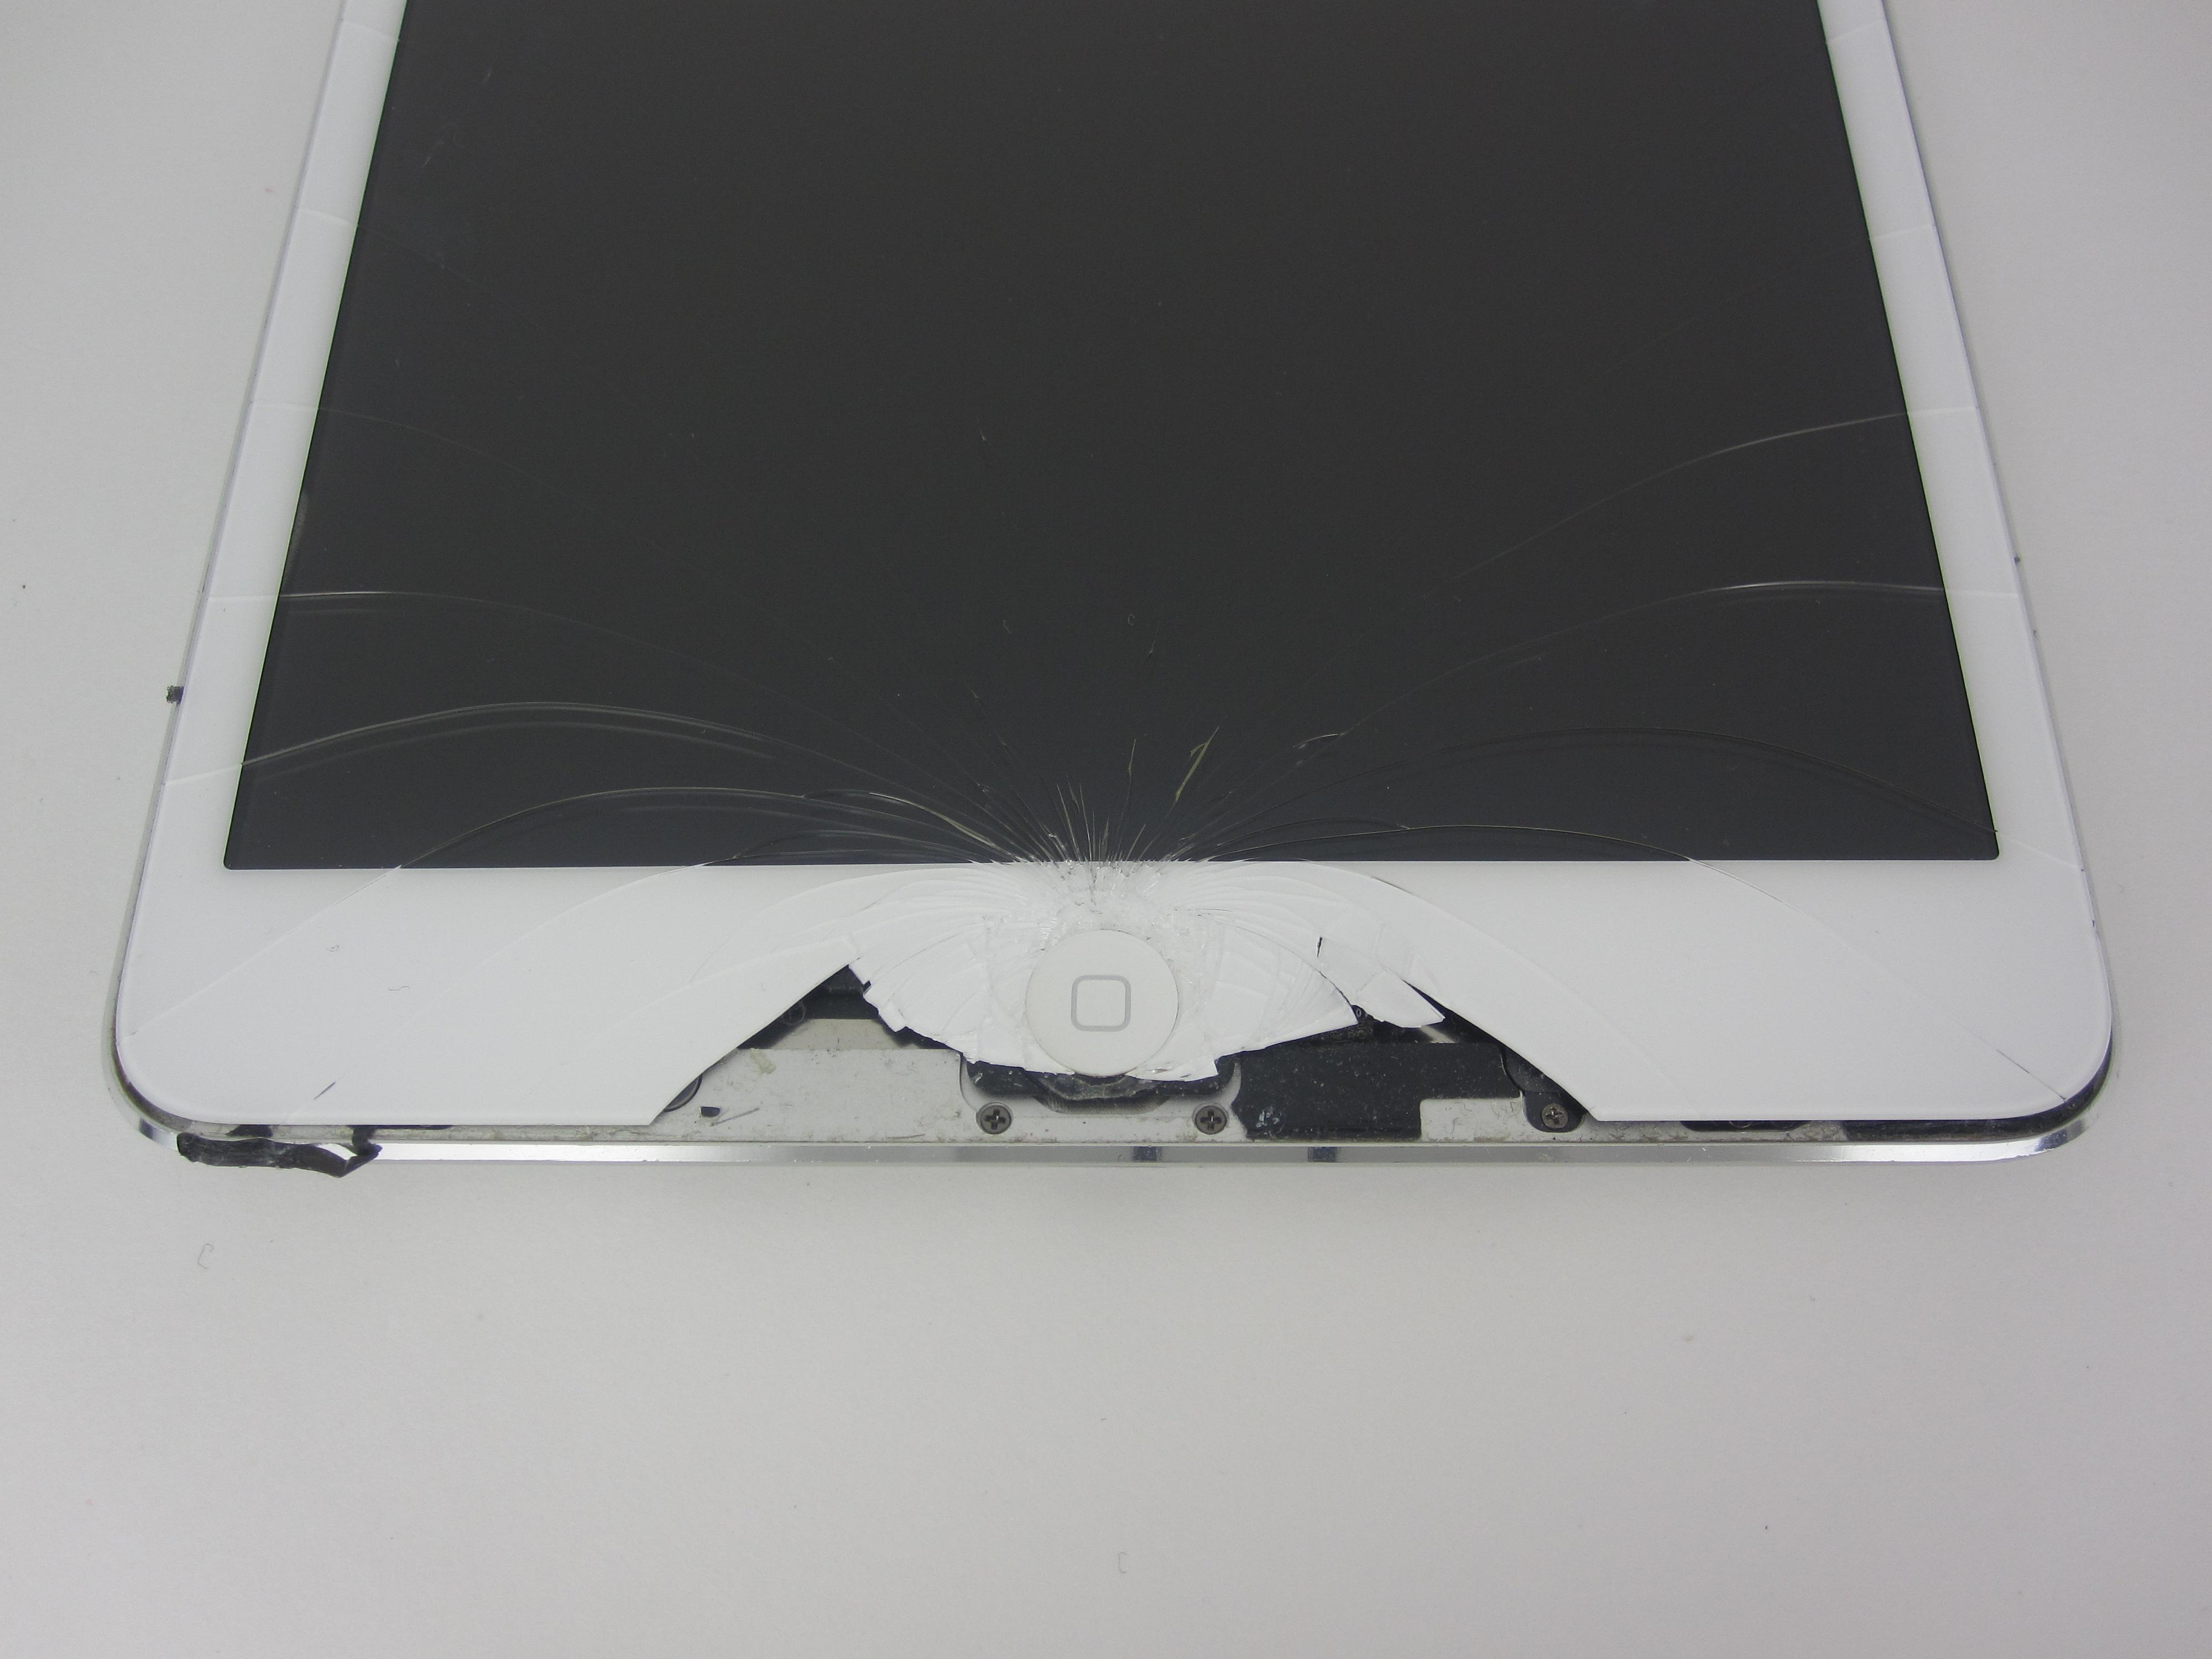 ремонт-аккумулятора-айпэдмини